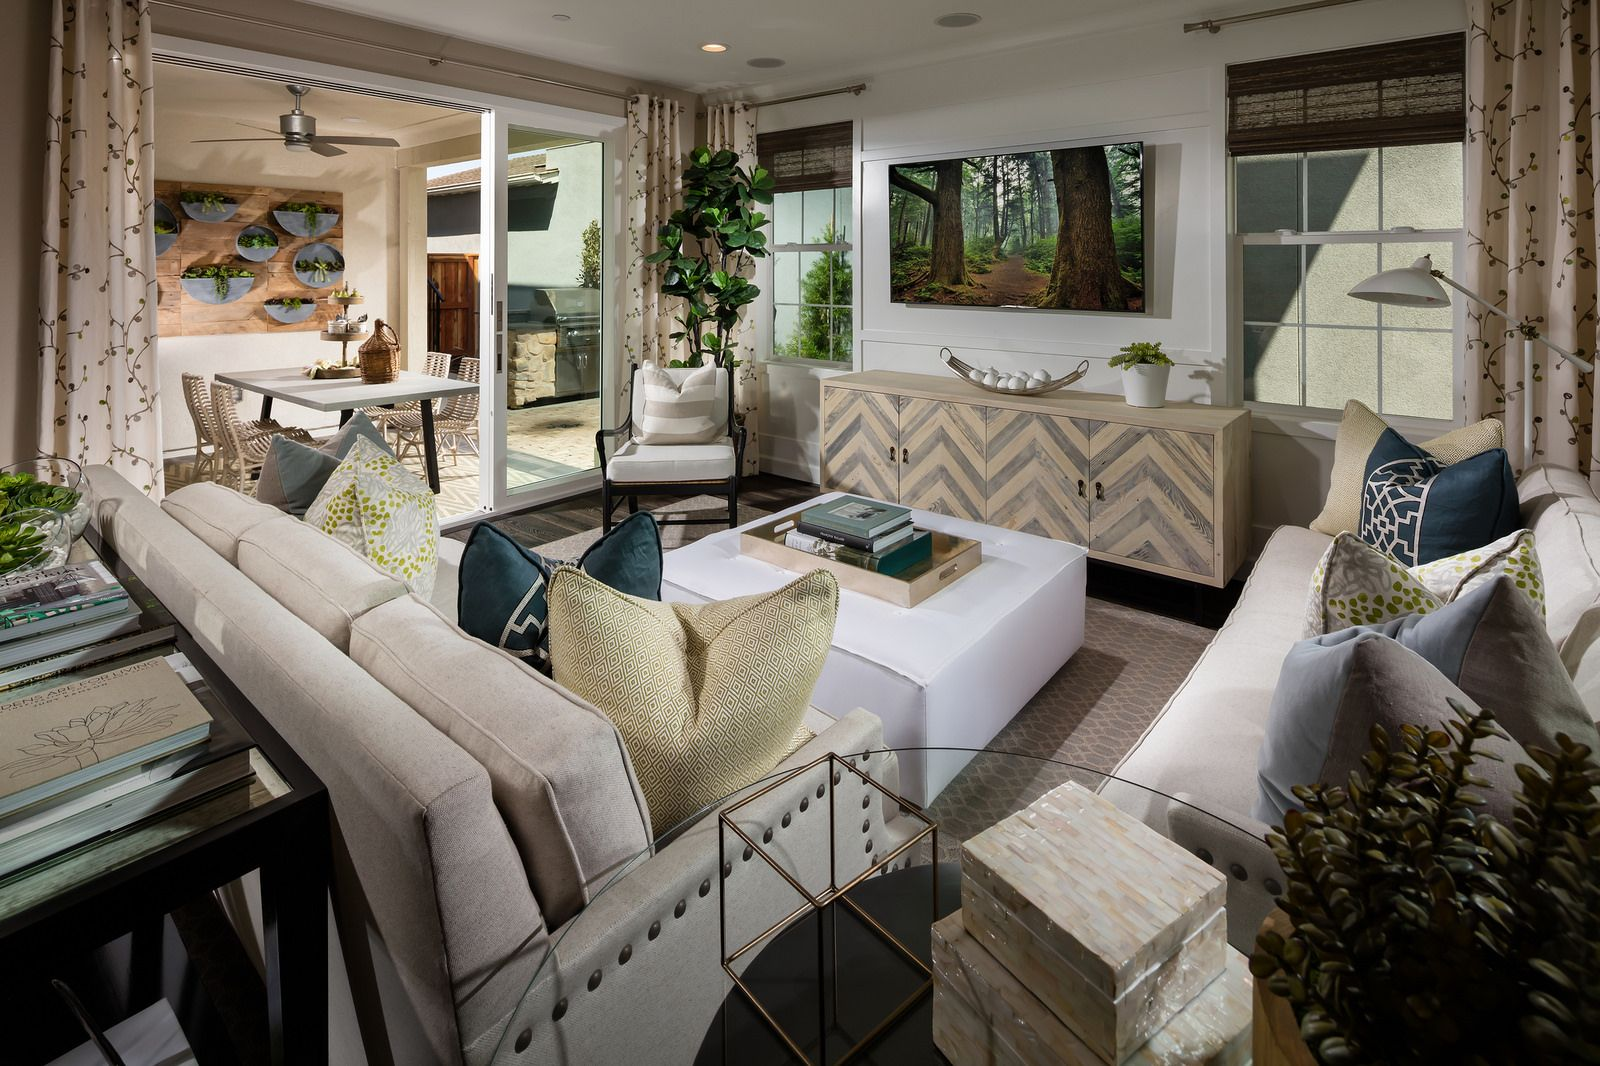 Persimmon P3 Famliy Room | Indoor outdoor living, Home ... on Patio Living Room Set id=88785